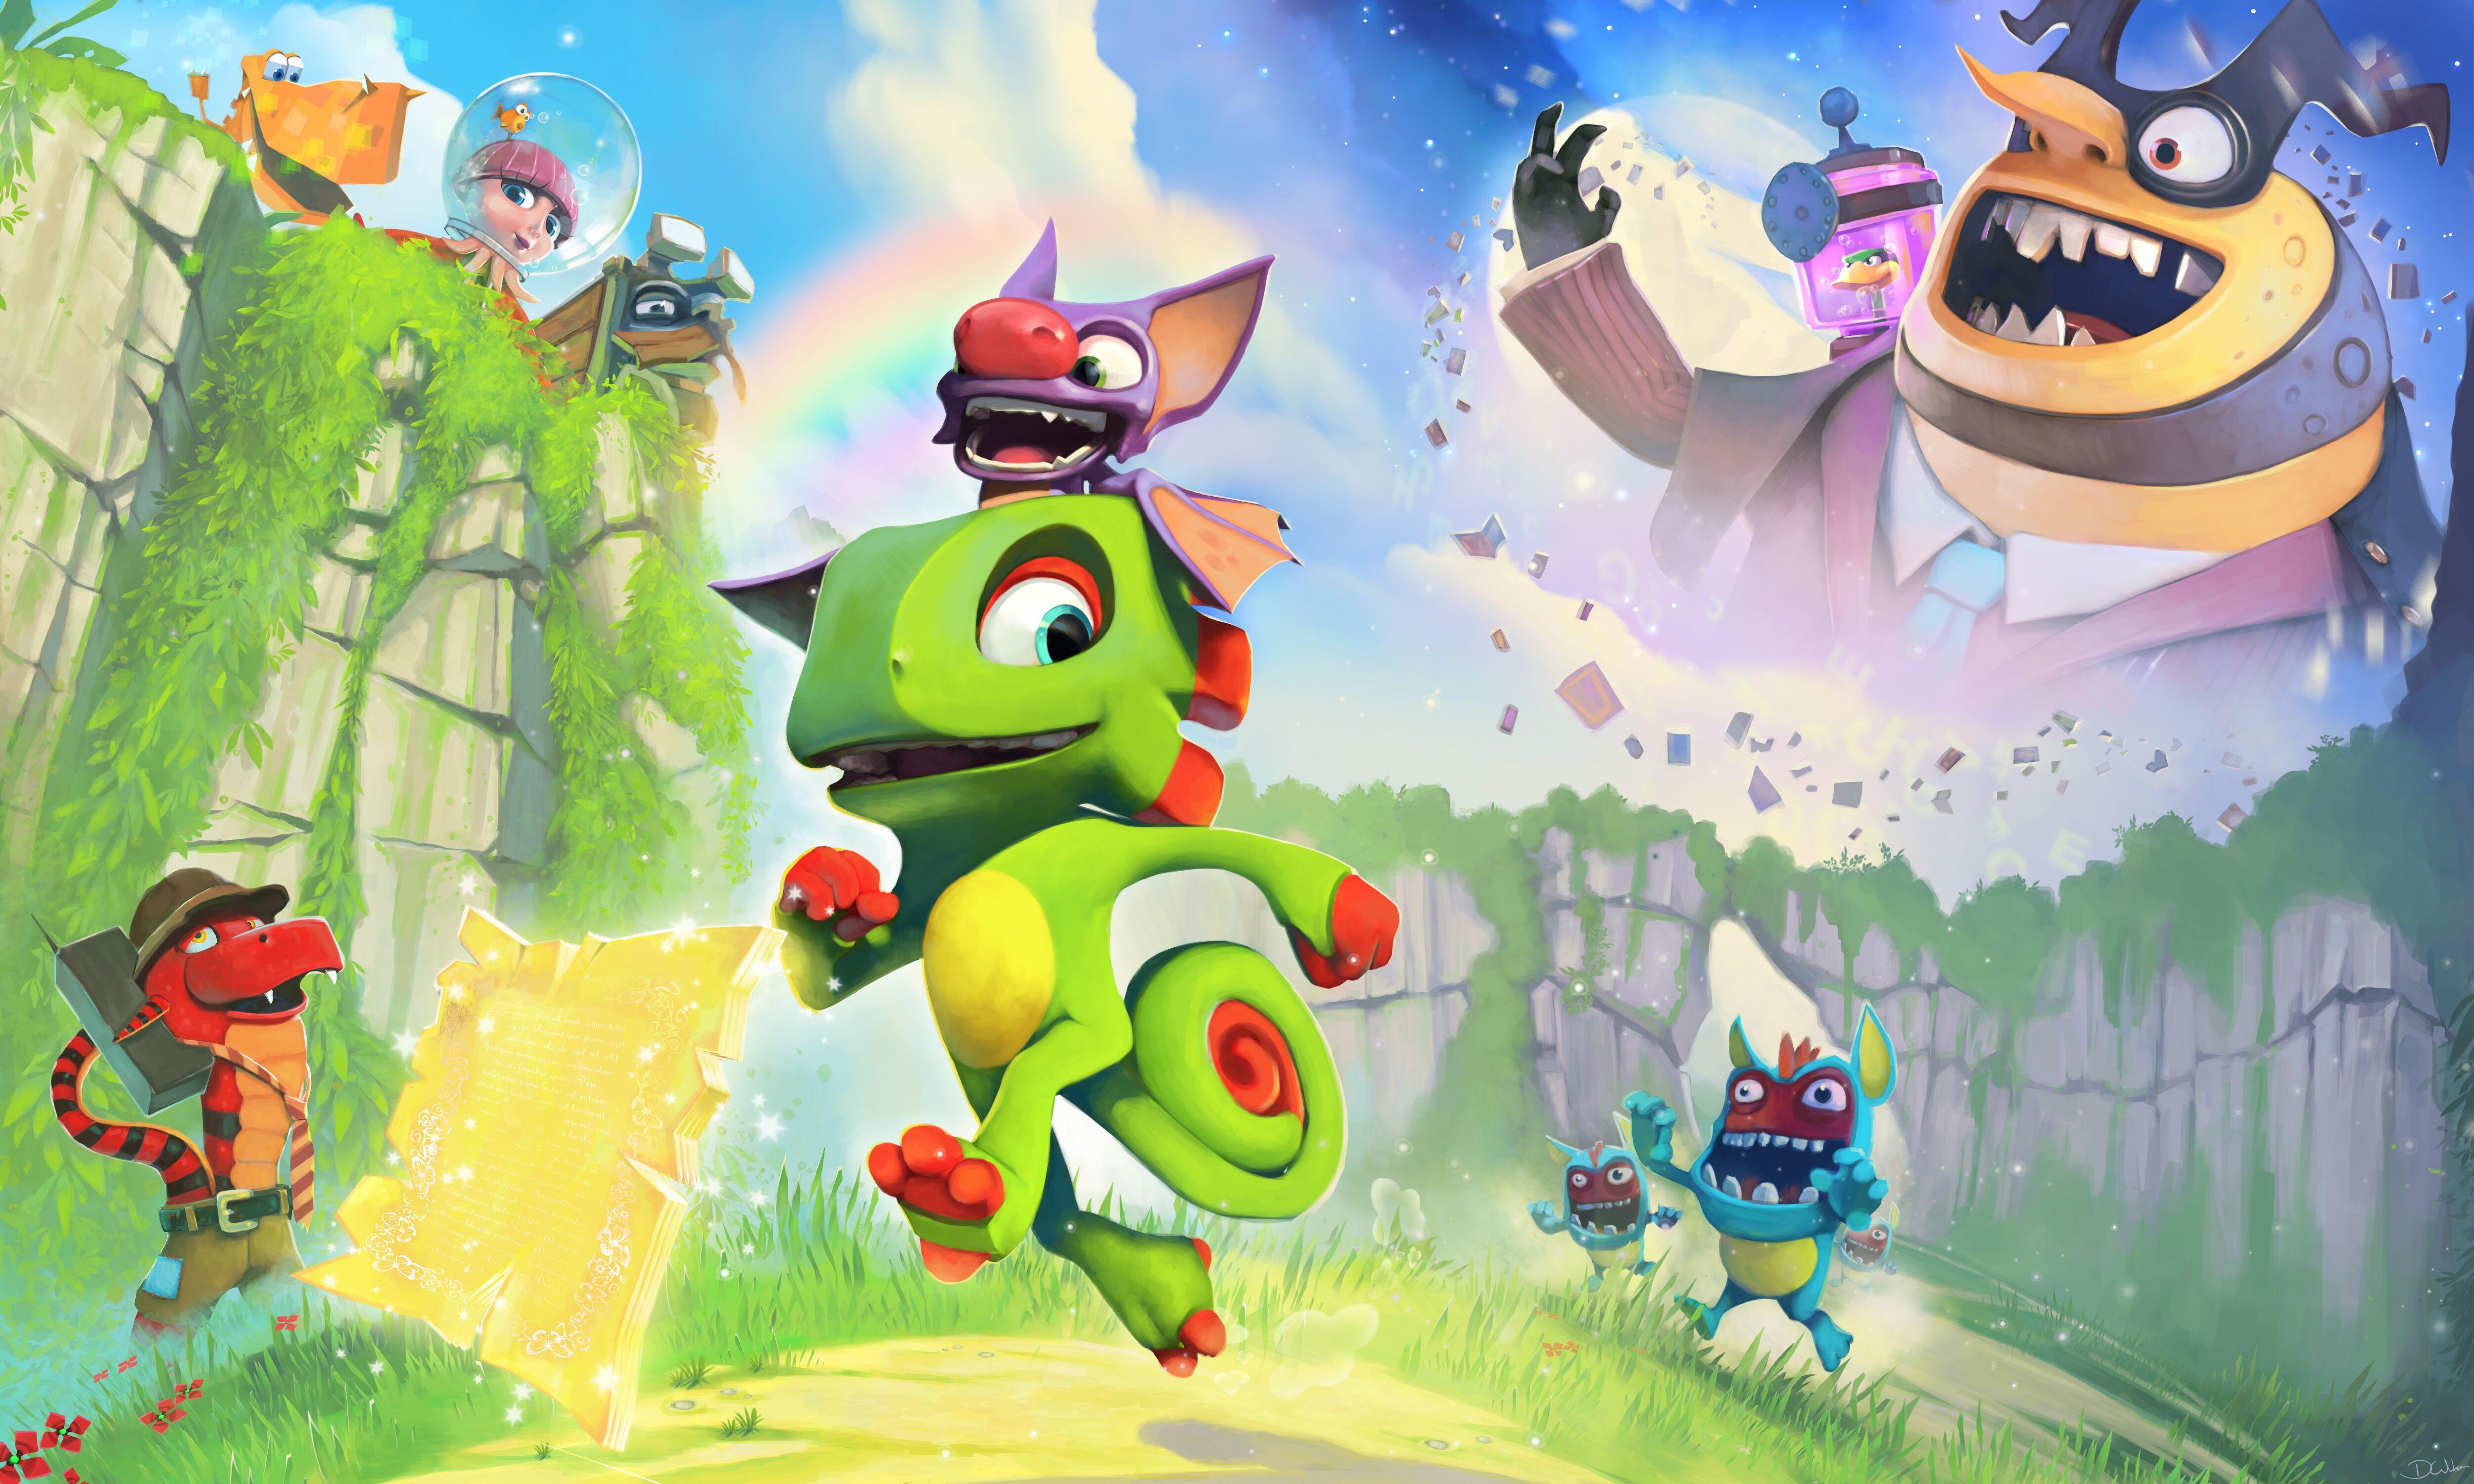 Yooka-Laylee oznamuje mega multiplayerové režimy 136747